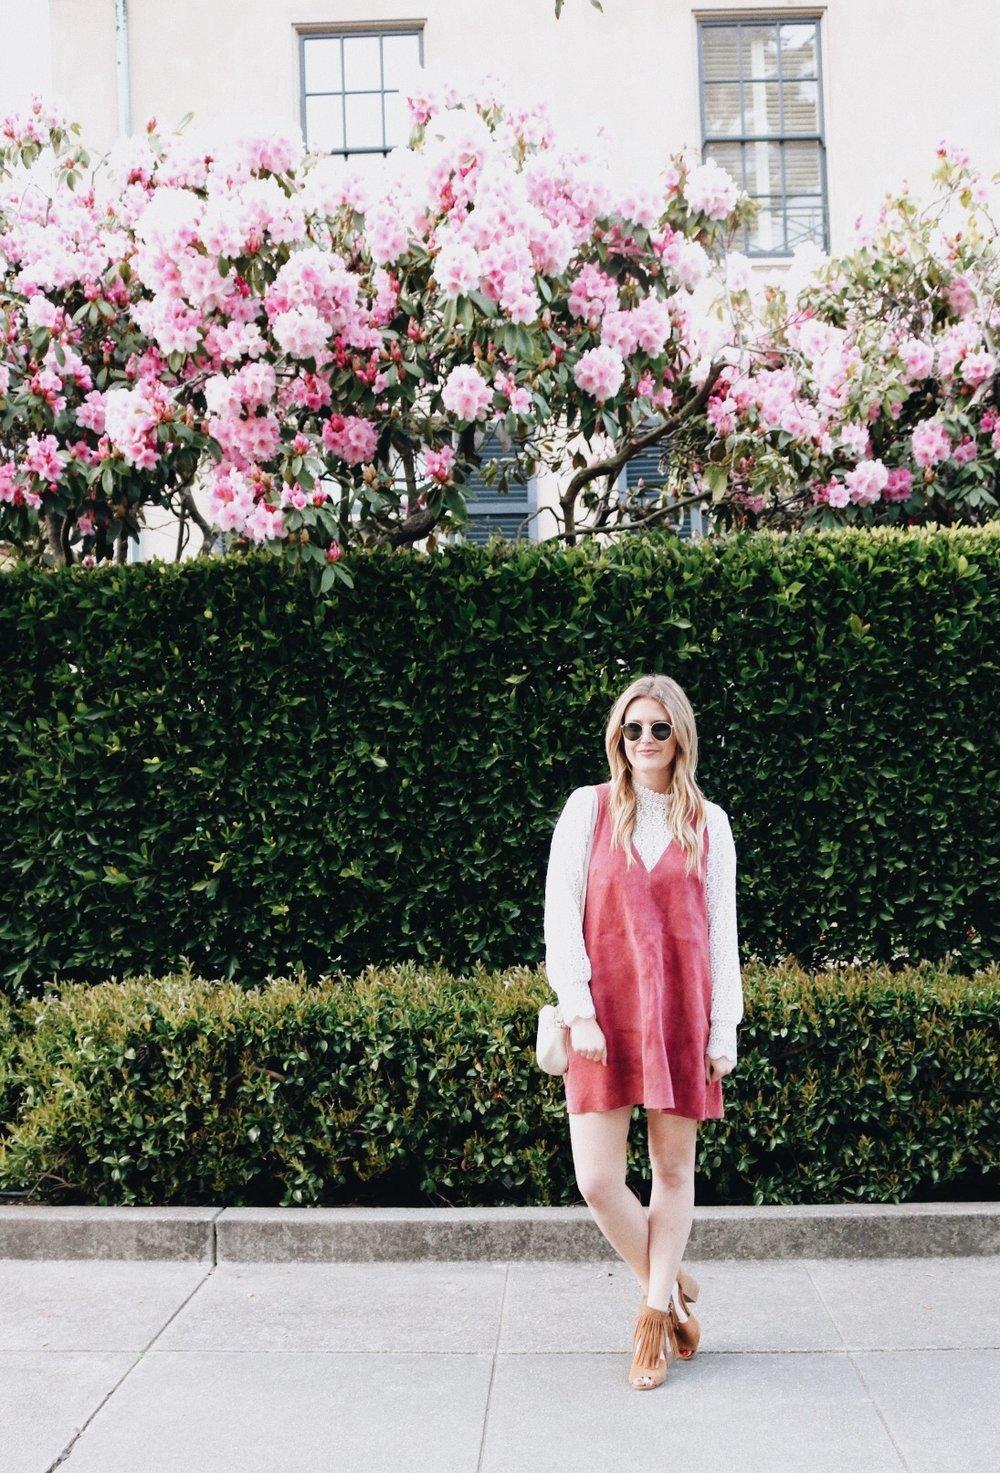 fp-pink-dress.jpg